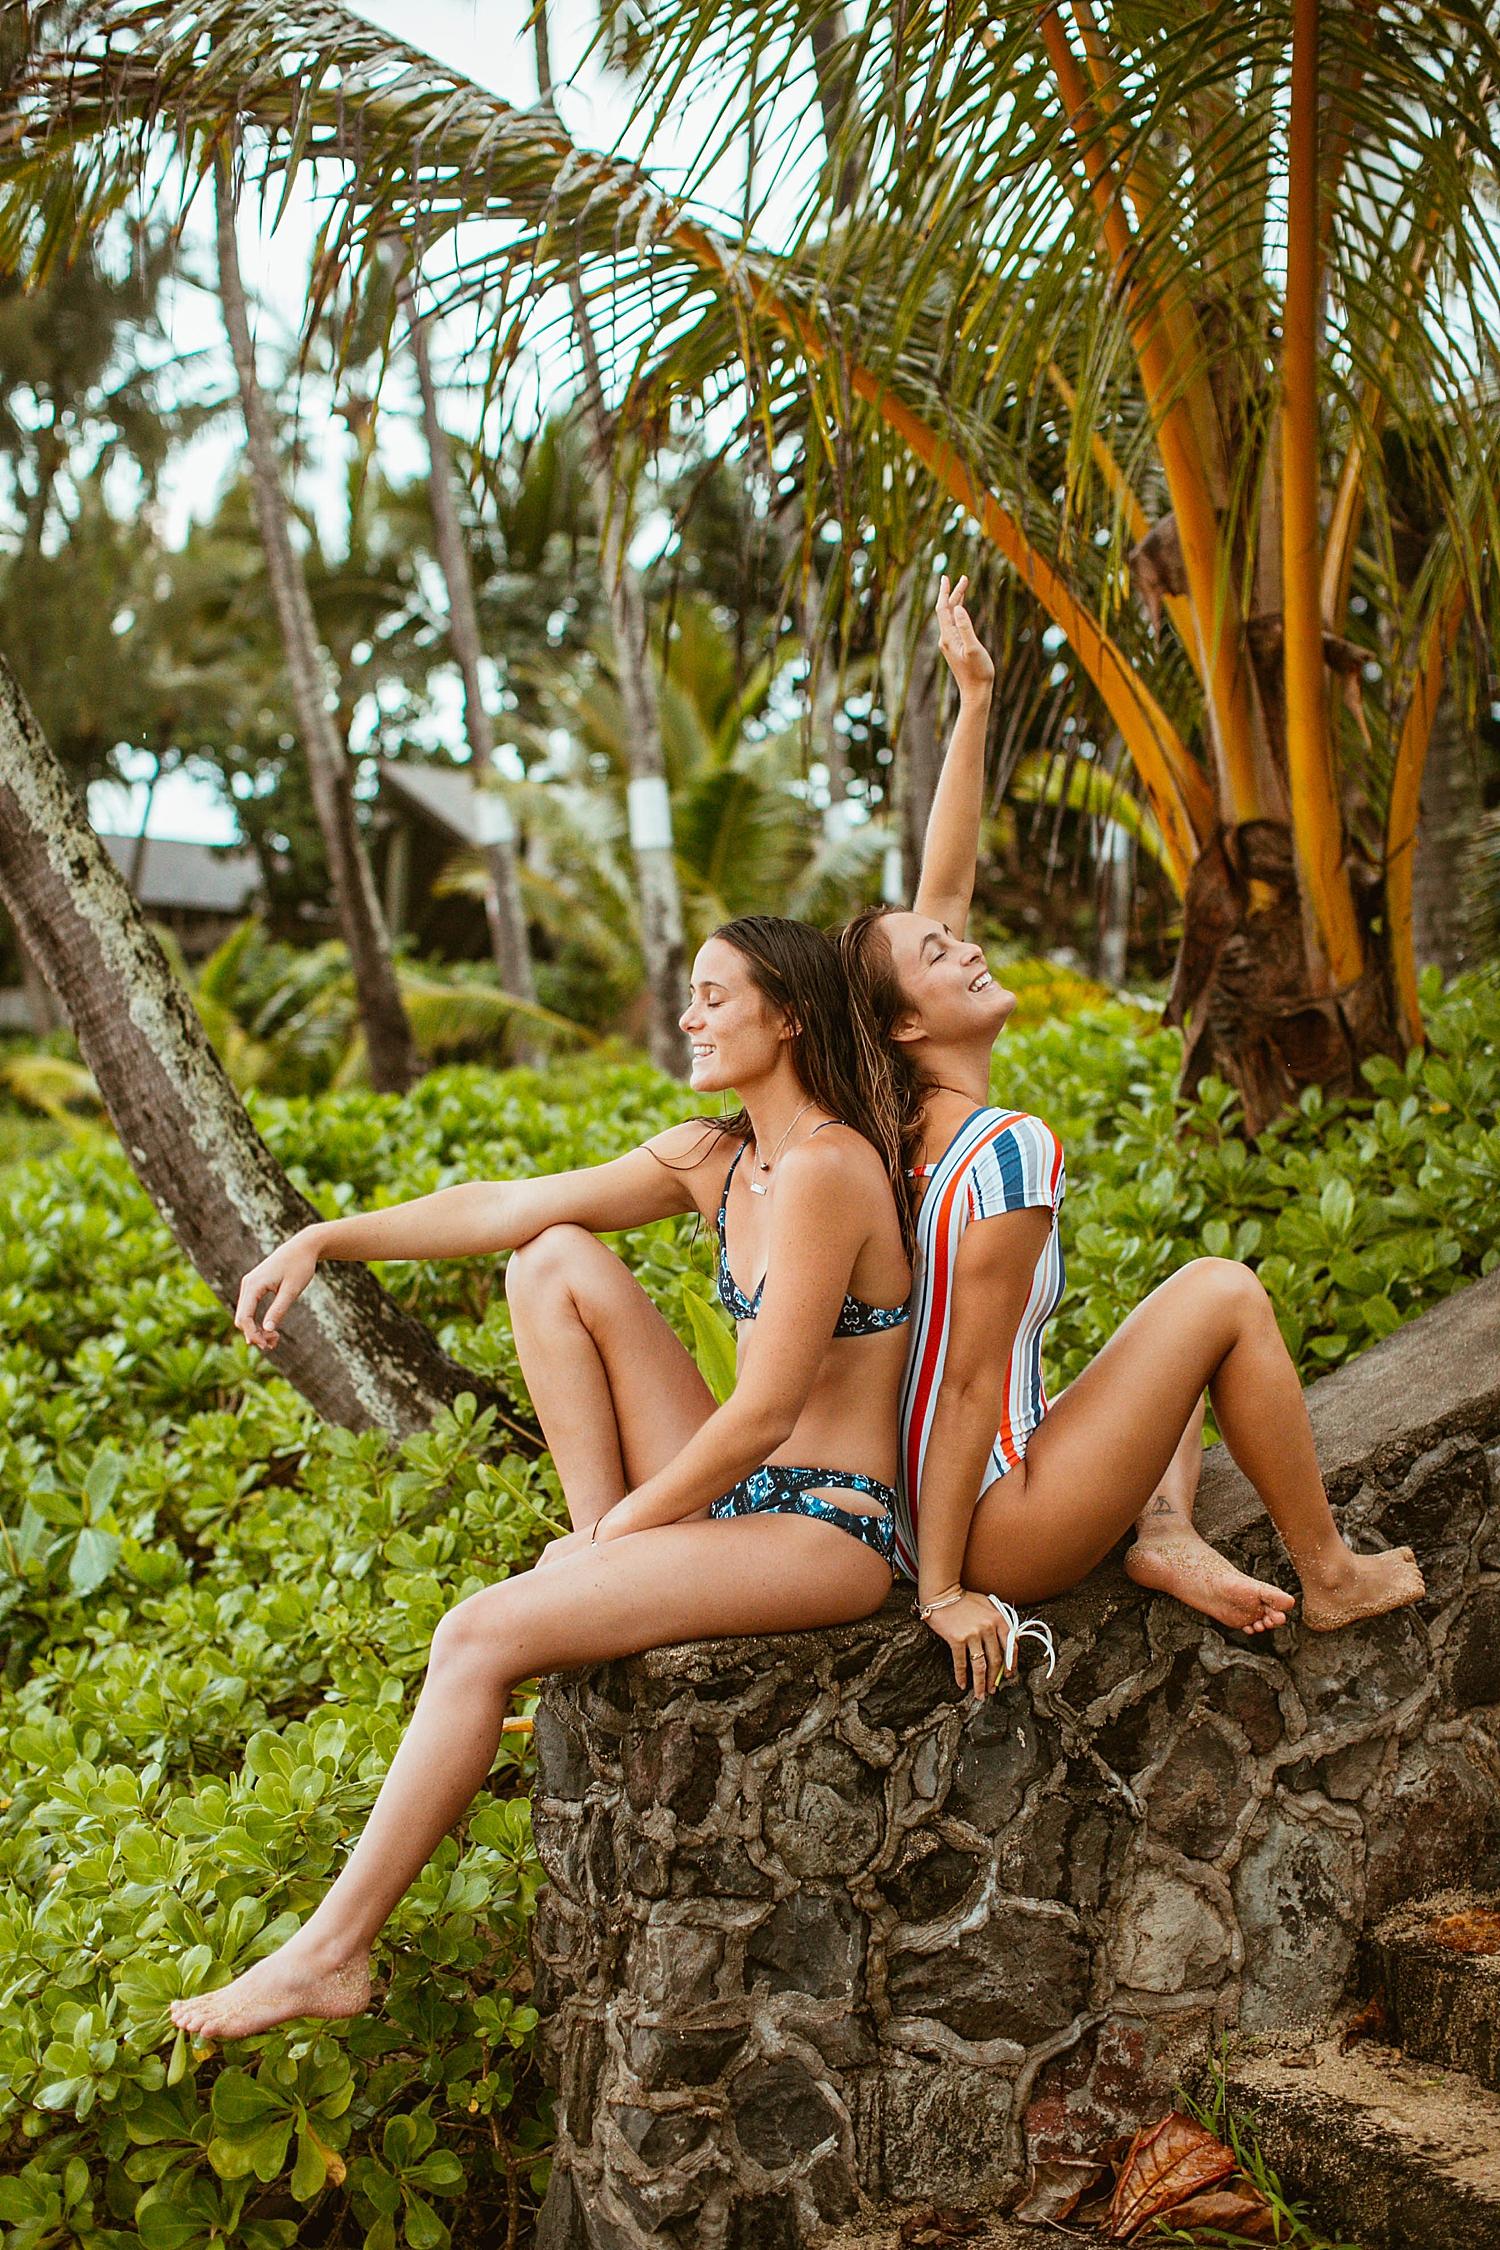 Travel & Lifestyle Fashion Photography with Benoa Swim, Cami and Jax, Bailey Nagy and Kiana Fores by Kelee Bovelle on North Shore Oahu Hawaii_0023.jpg